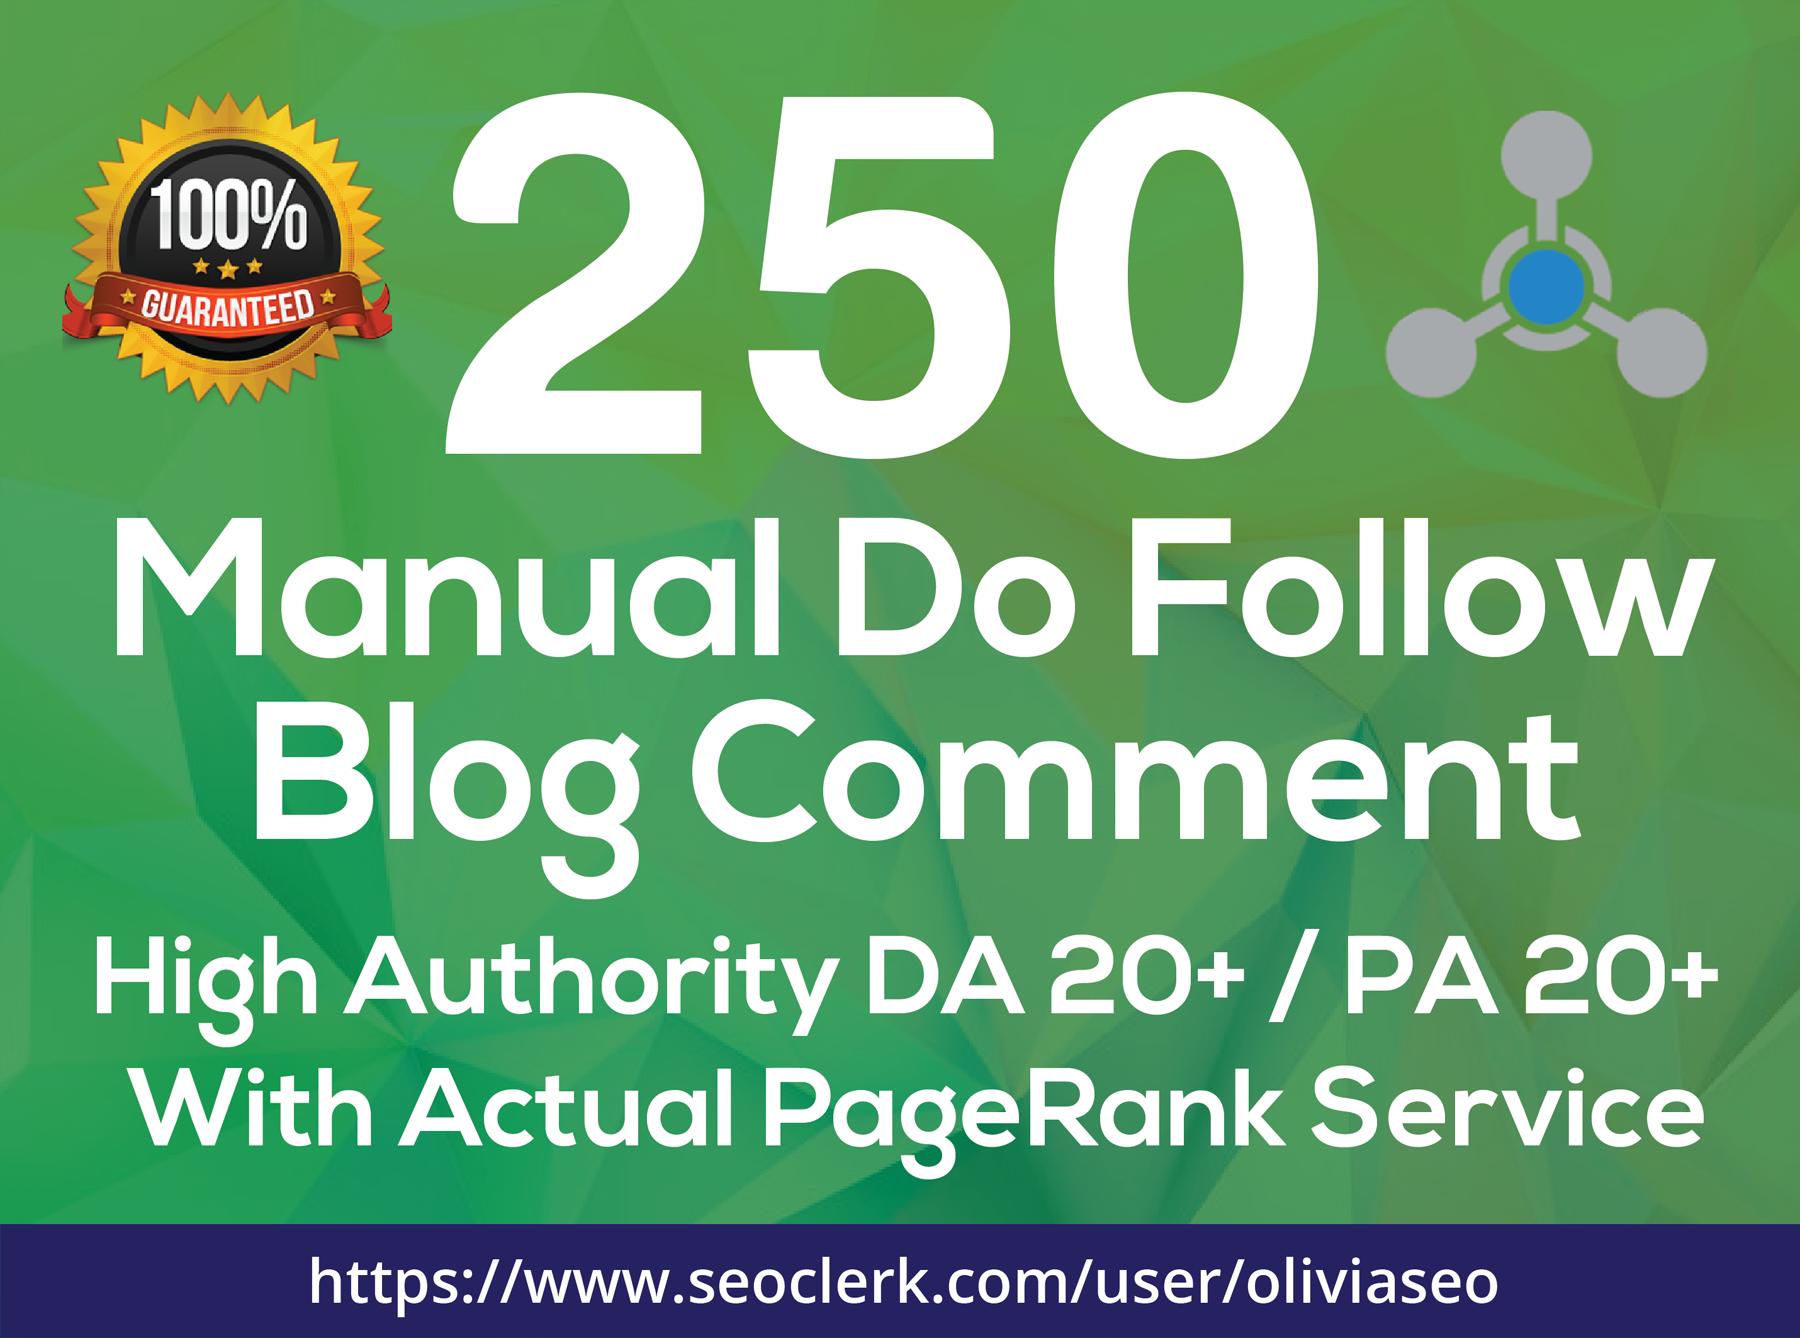 Provide 250 Manual Dofollow Blog Comment Low OBL Backlink